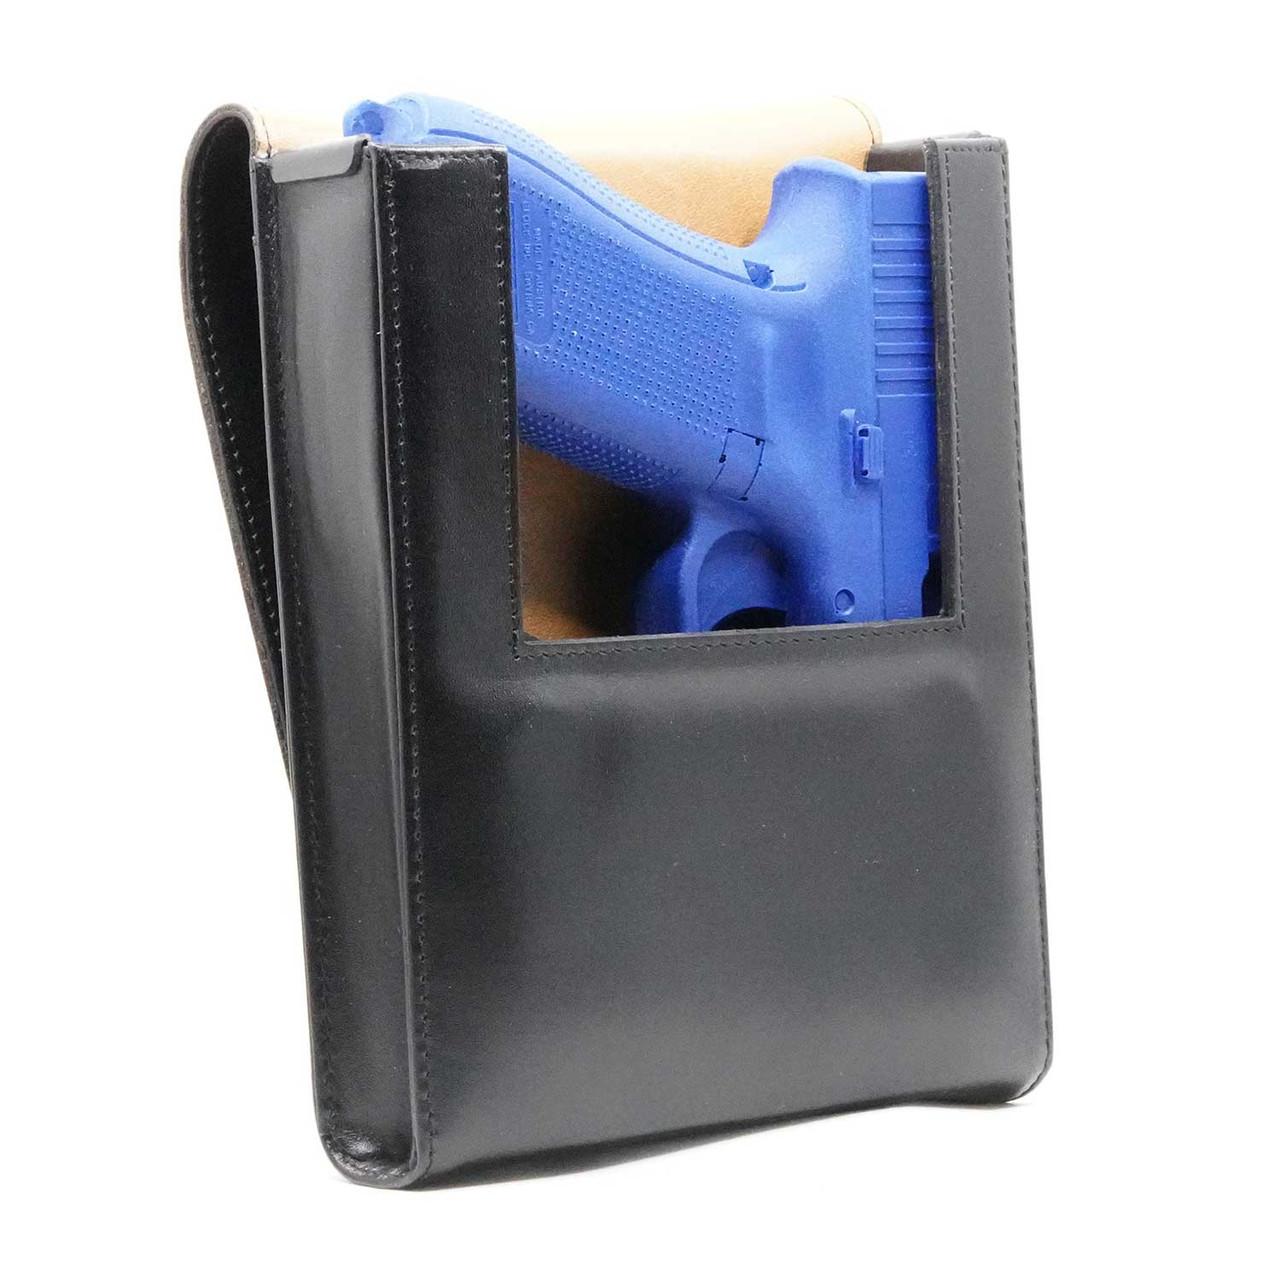 Glock 19X Sneaky Pete Holster (Belt Clip)